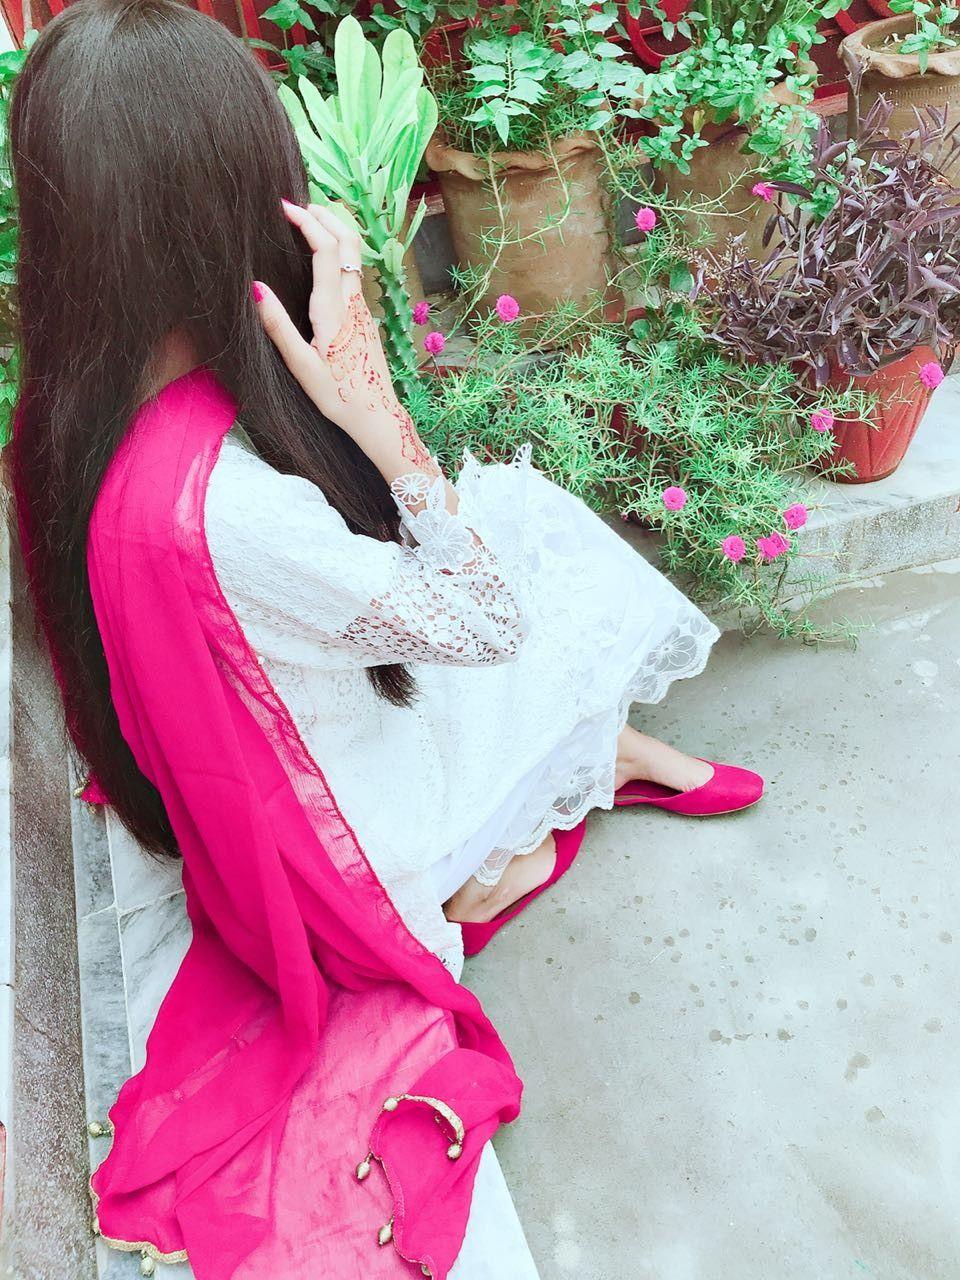 Cool and stylish girls dpz catalog photo